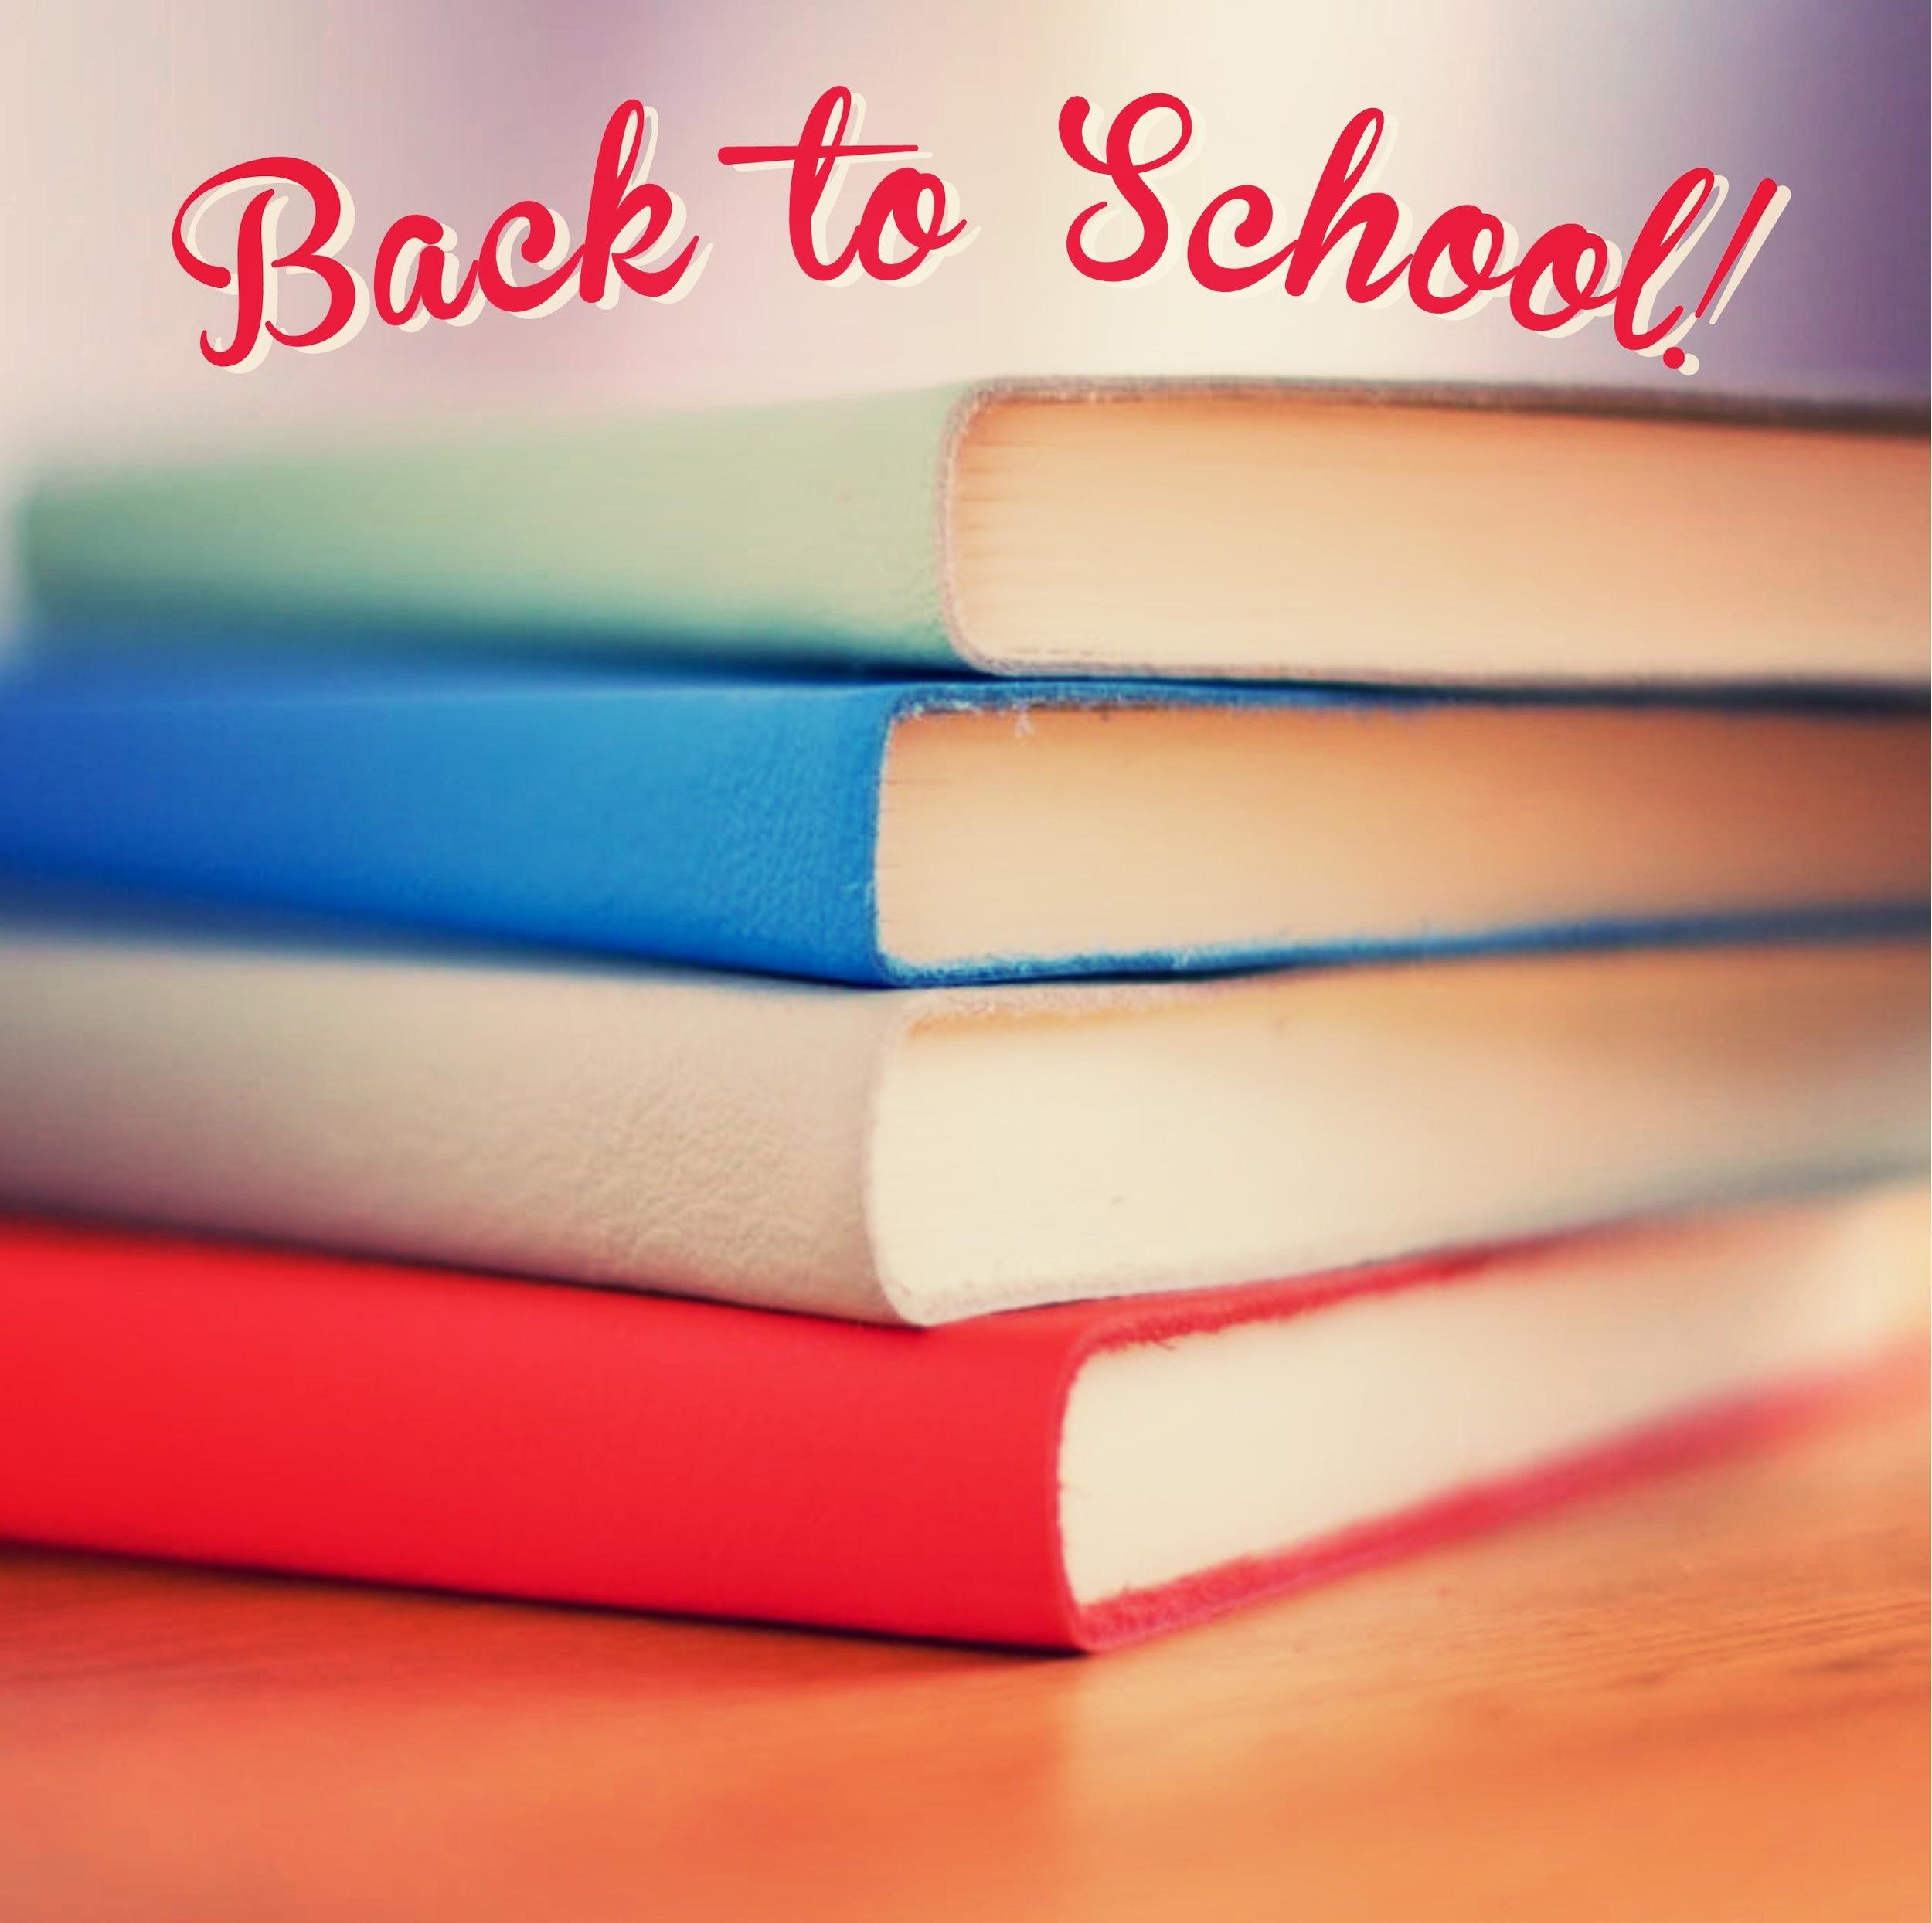 Back to School Insta 081418.jpg